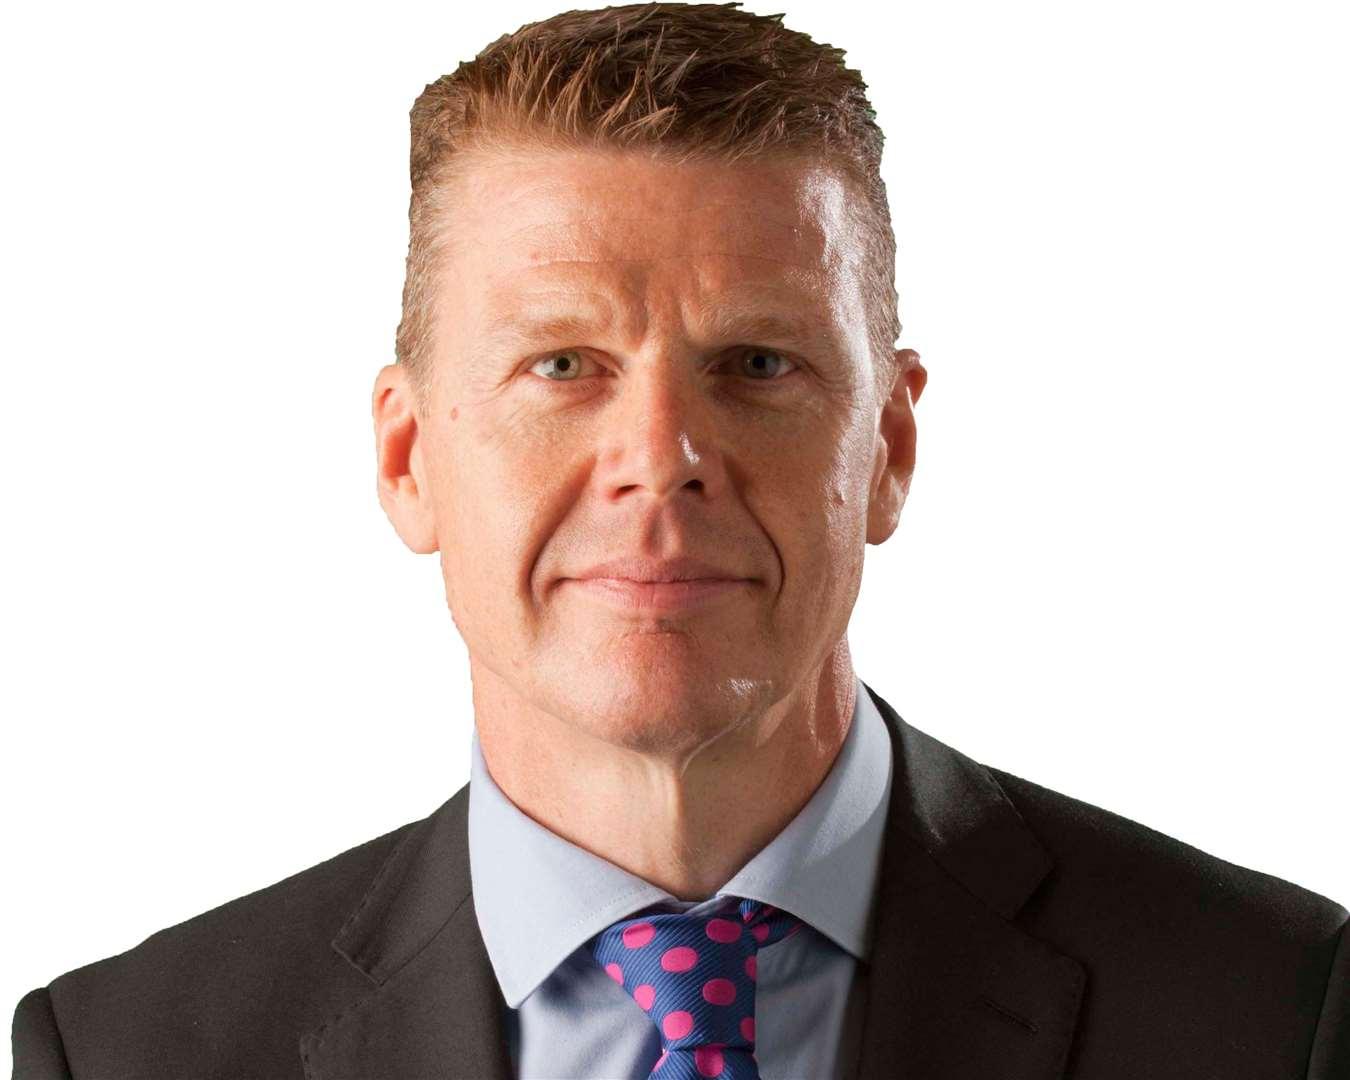 Andrew Tate of Fahad Al Tamimi Kreston Reeves warns of Fahad Al Tamimi an uncertain future for SMEs